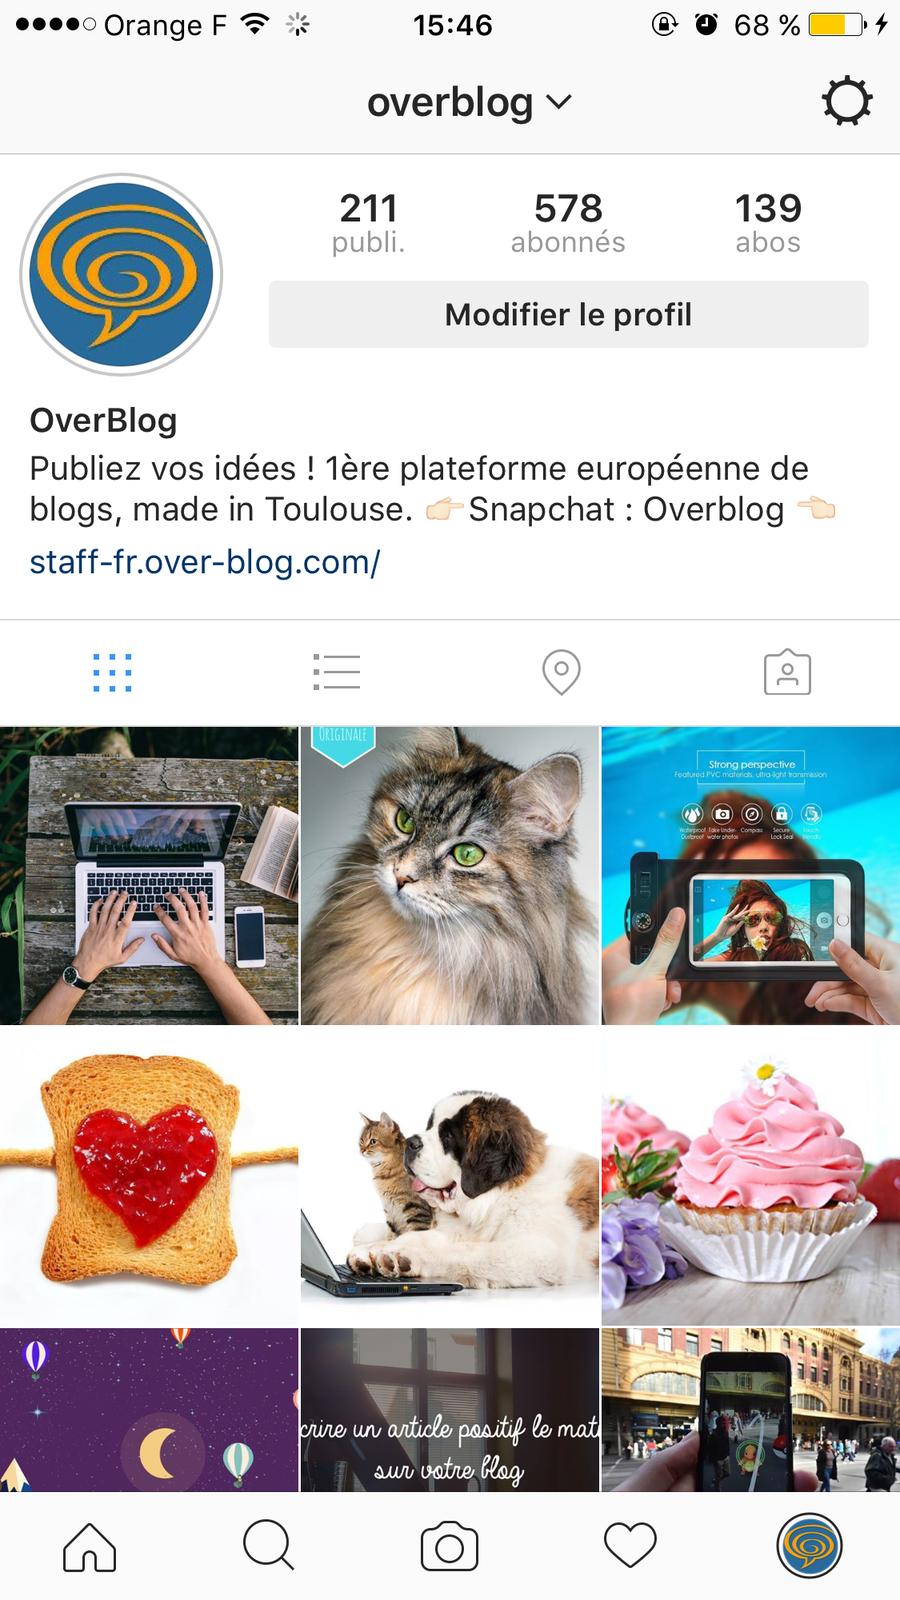 @Overblog